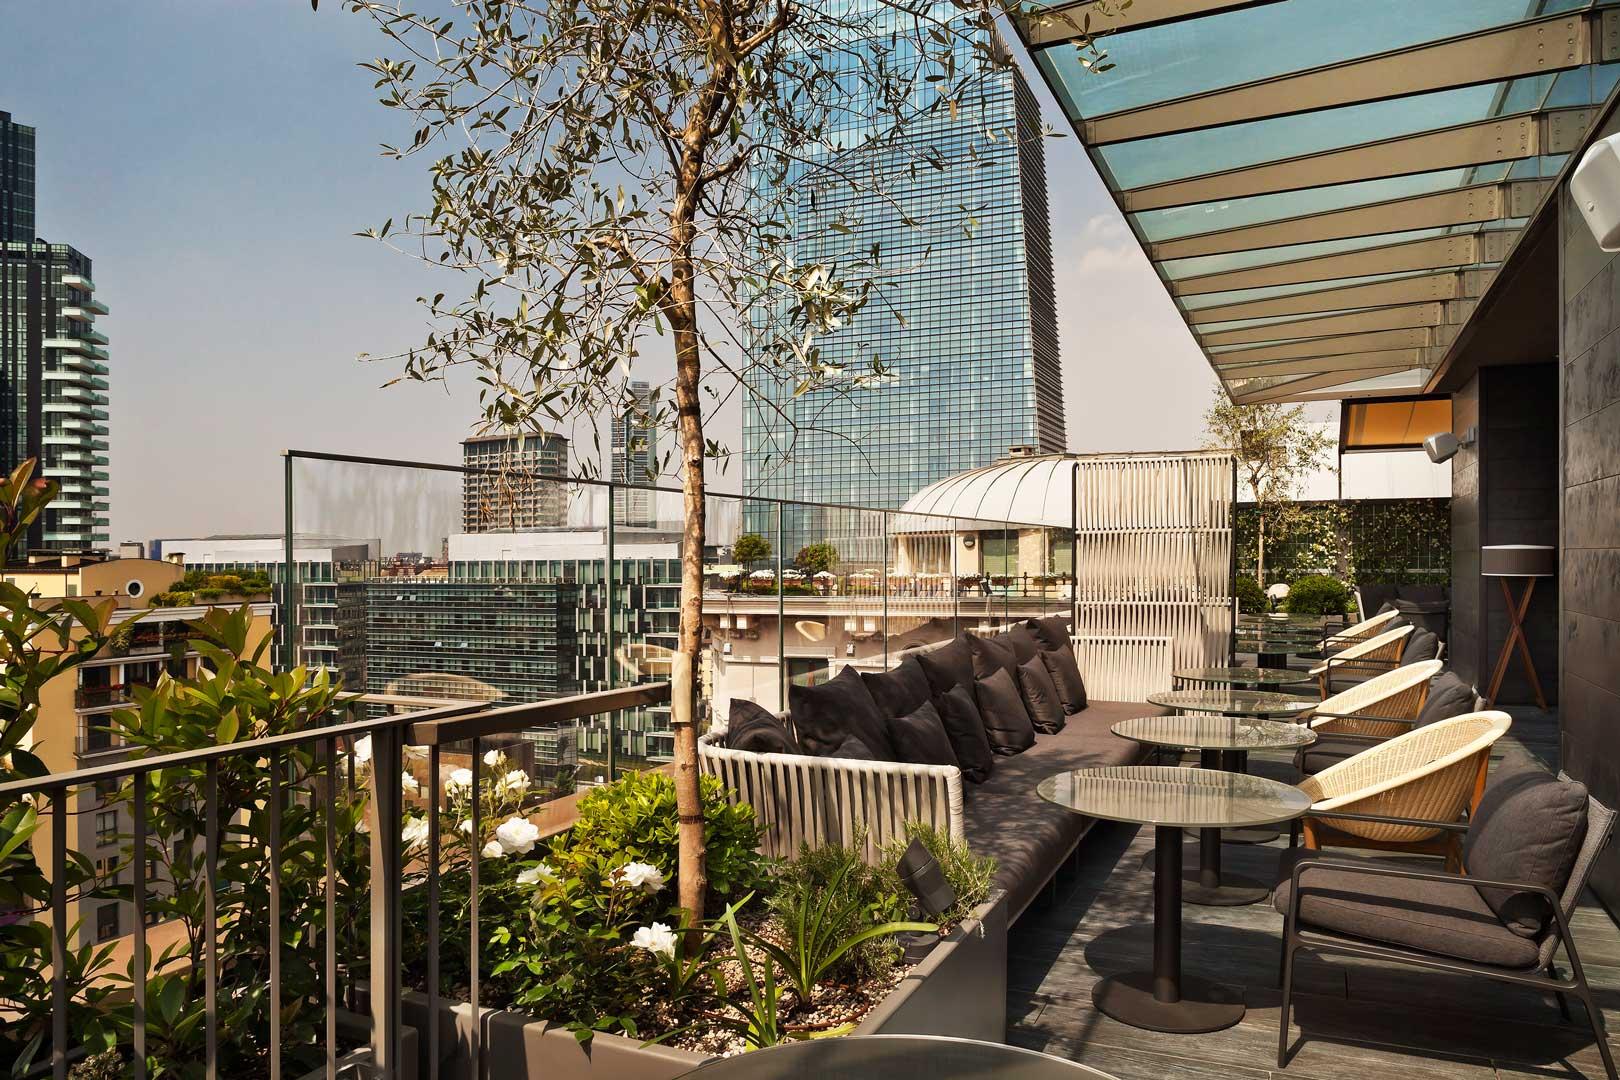 REST - Милан в августе: рестораны